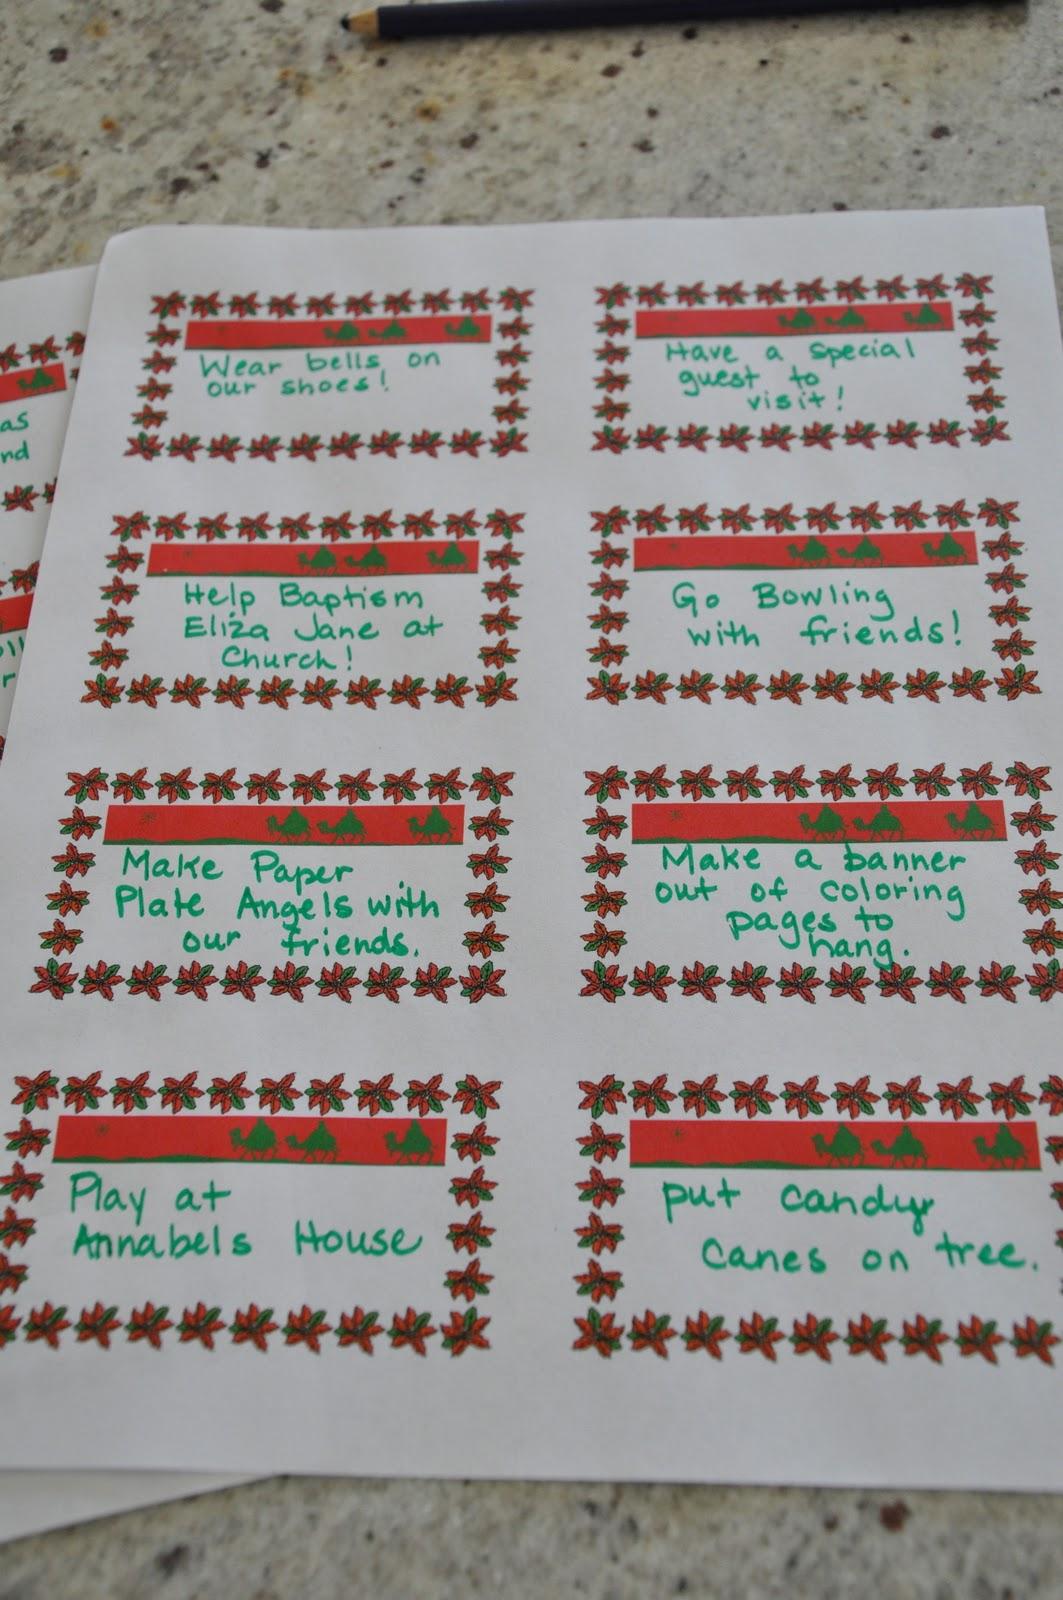 ... 1600 jpeg 256kB, Teachingmom Advent Calendar | Calendar Template 2016